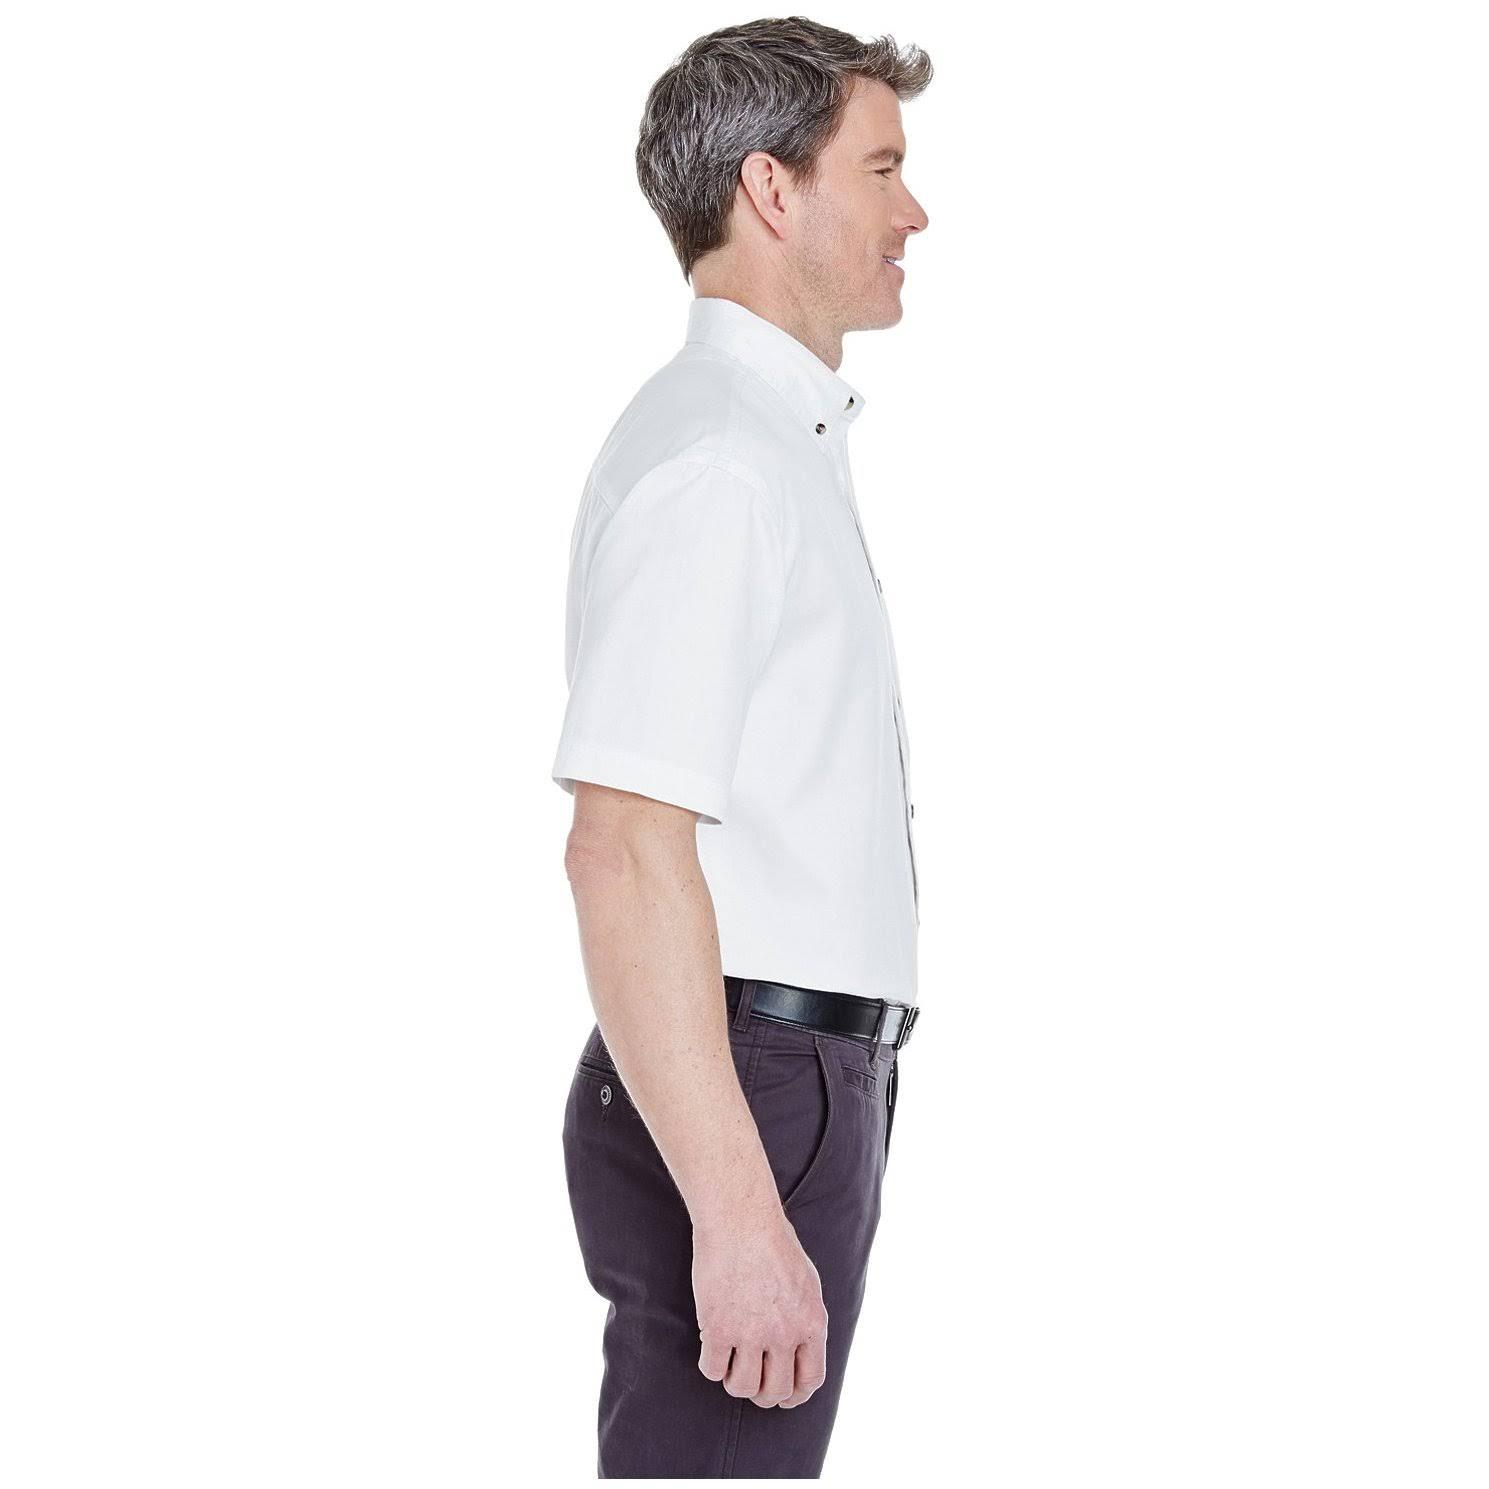 Mezclilla Para Grande Tejido Tejida 8965 Camisa Bolsillo Ultraclub De Adultos Blanco RPOBnAq